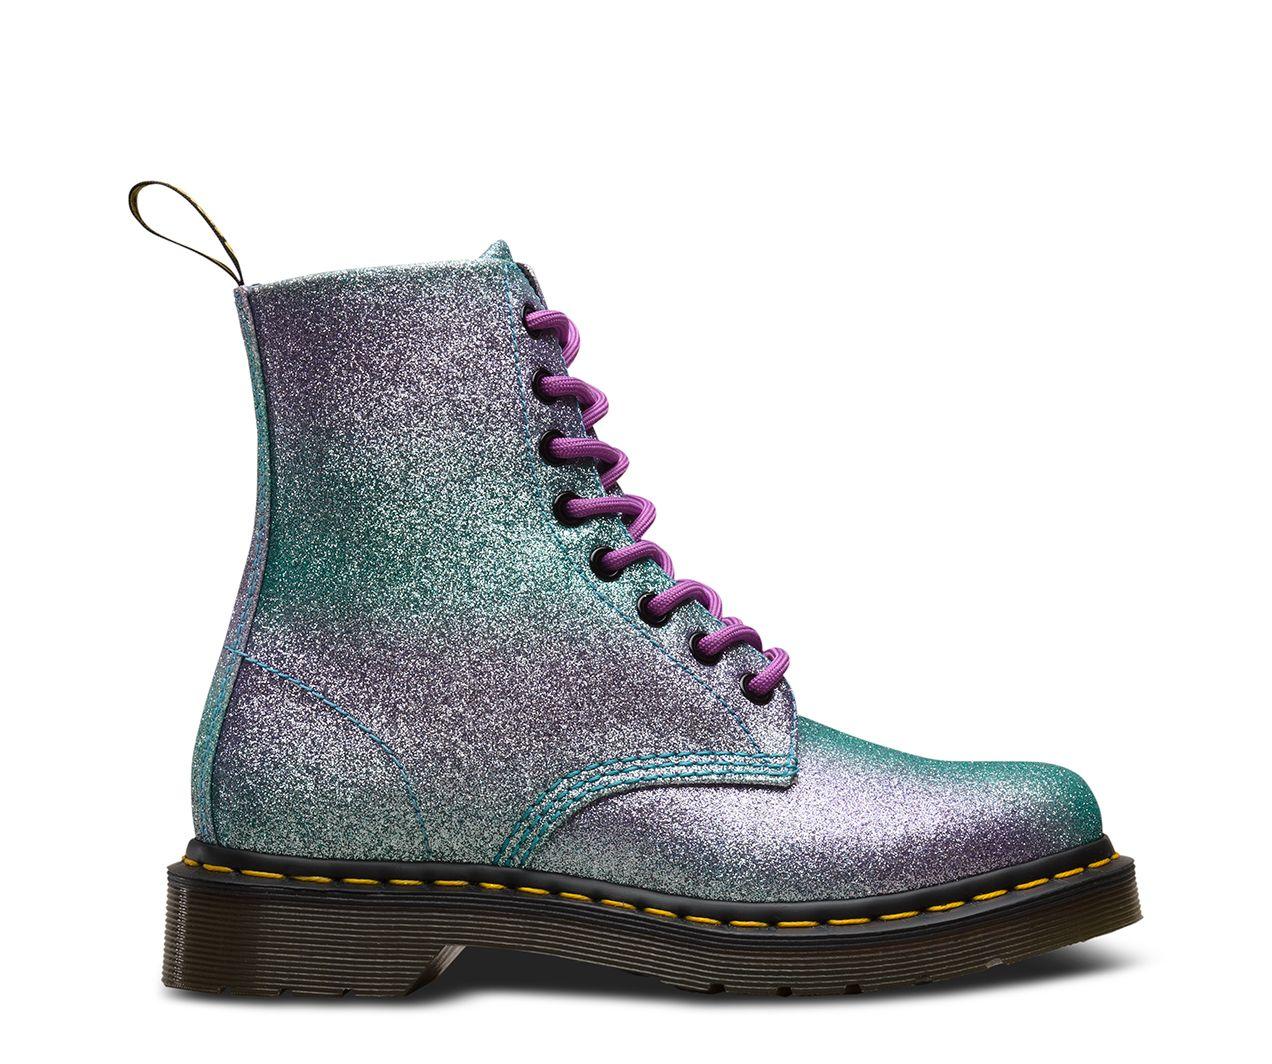 Ladies Dr Martens 1460 8-Eyelet Pascal Turquoise Glitter Boots UK Sizes 4-8 DM